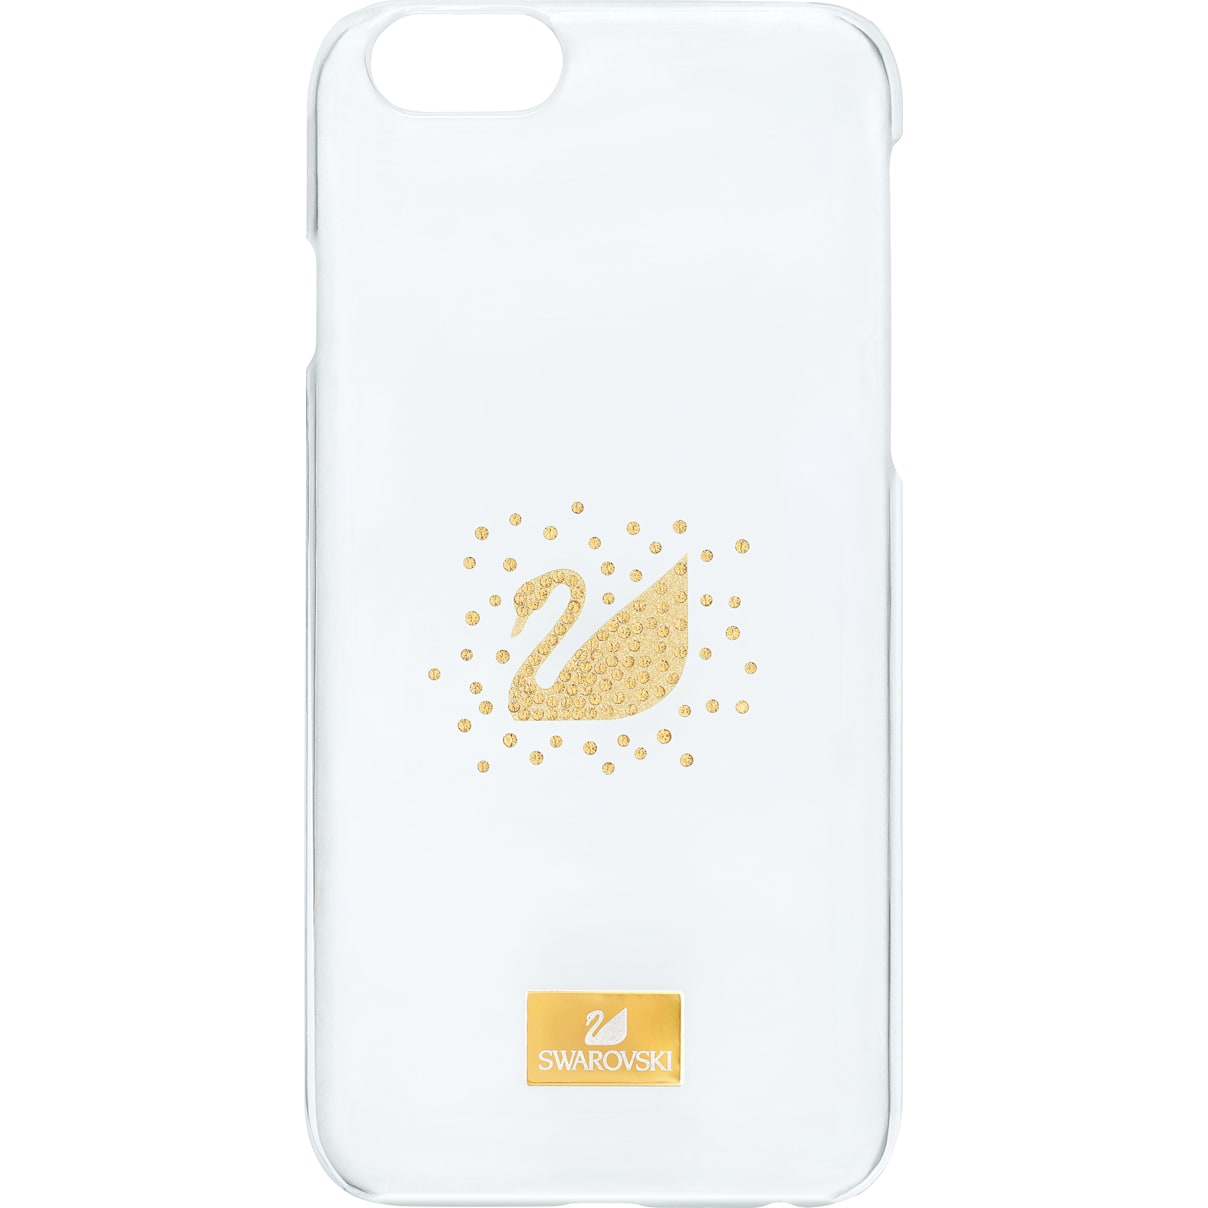 Swarovski Swan Golden Smartphone Case with Bumper, iPhone® 7